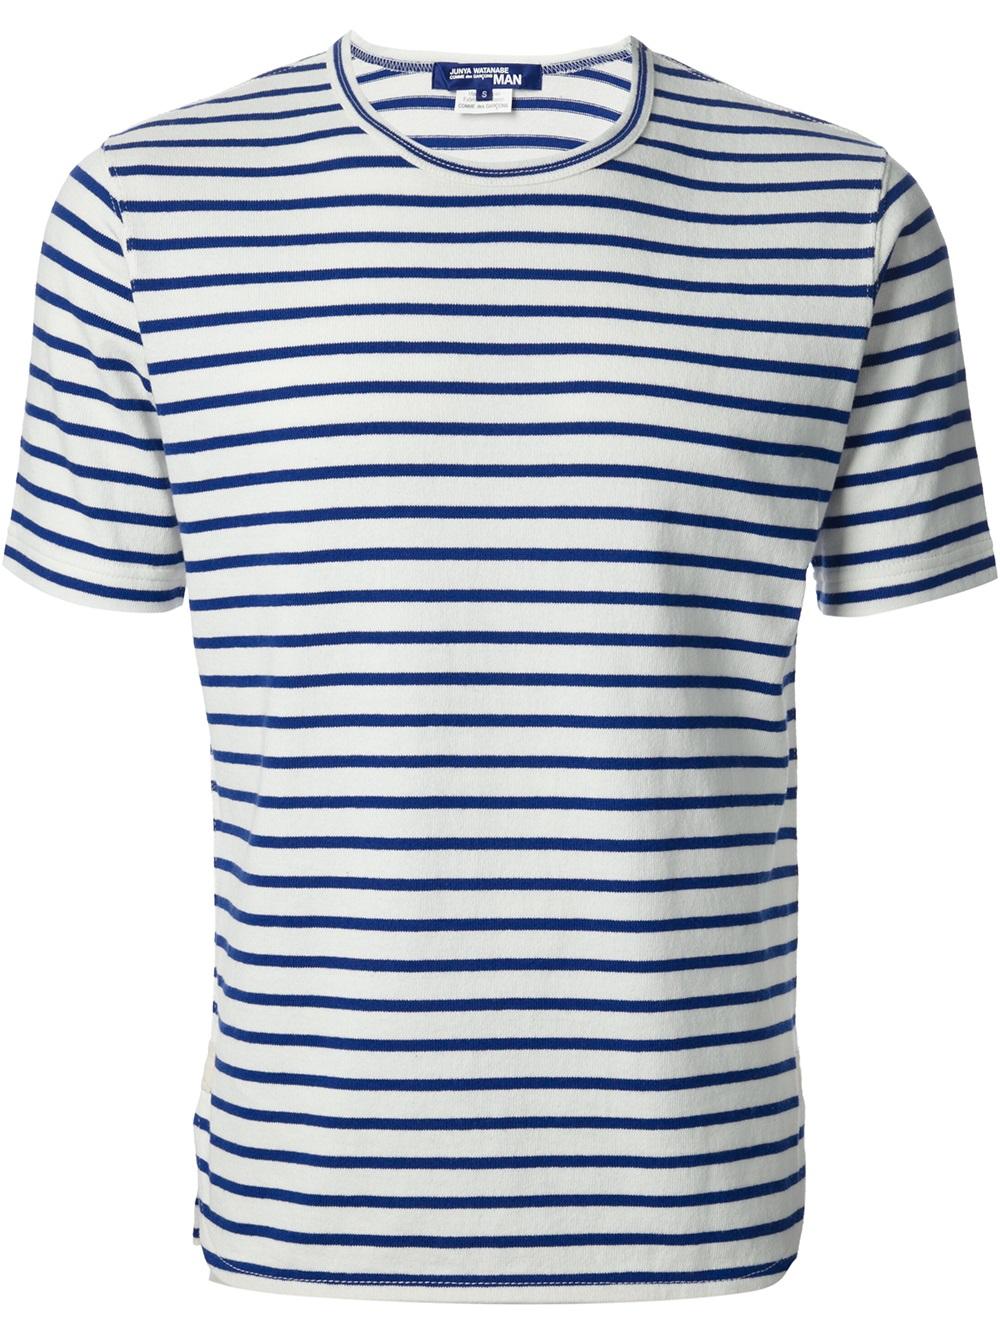 Lyst Junya Watanabe Striped Tshirt In Blue For Men